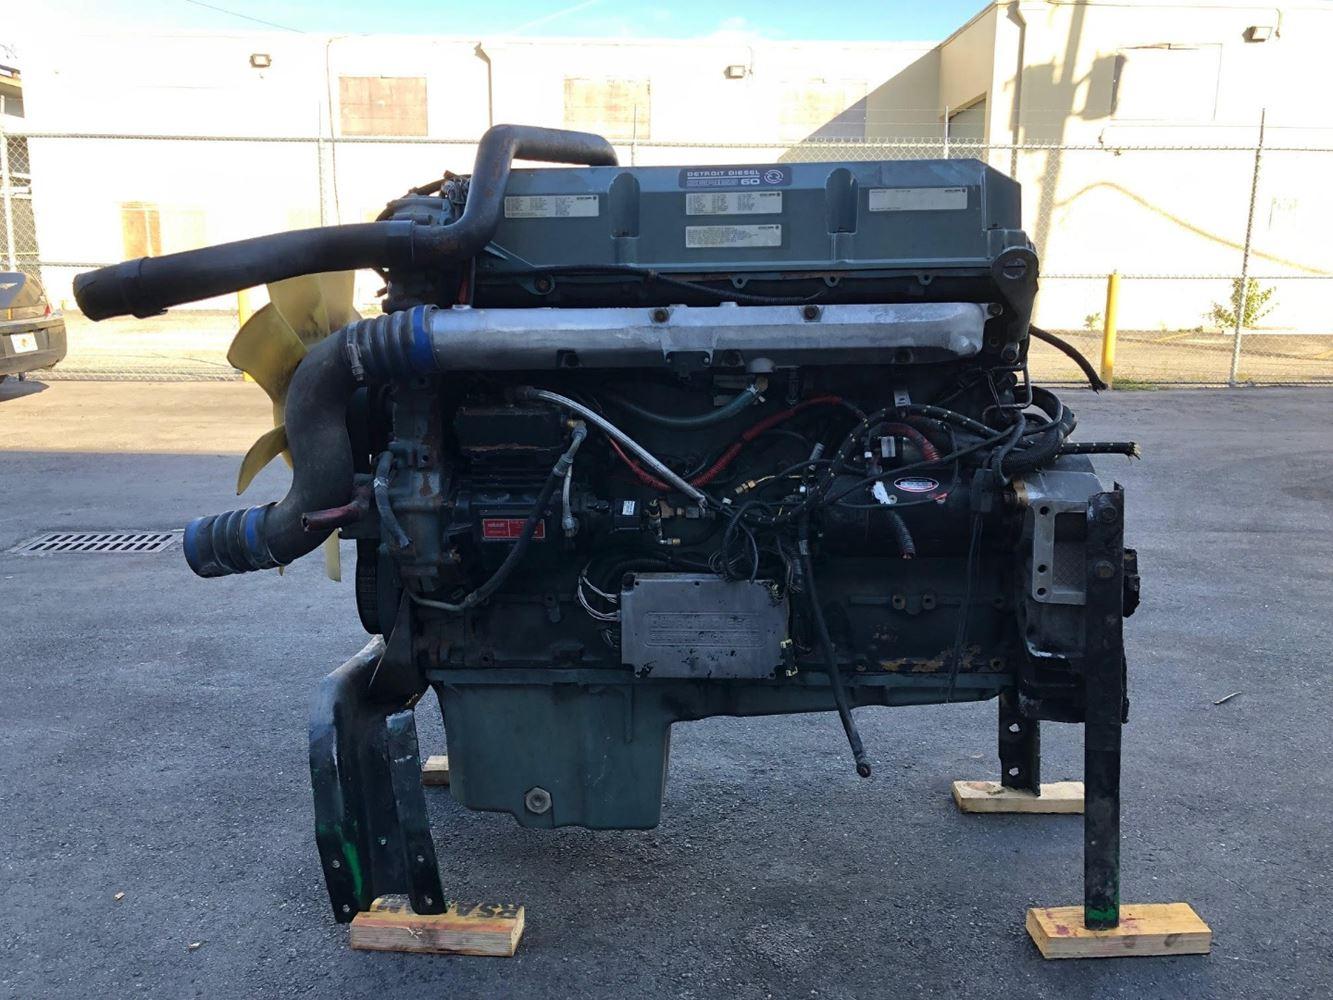 Detroit Series 60 12 7L DDEC IV (Stock #003945)